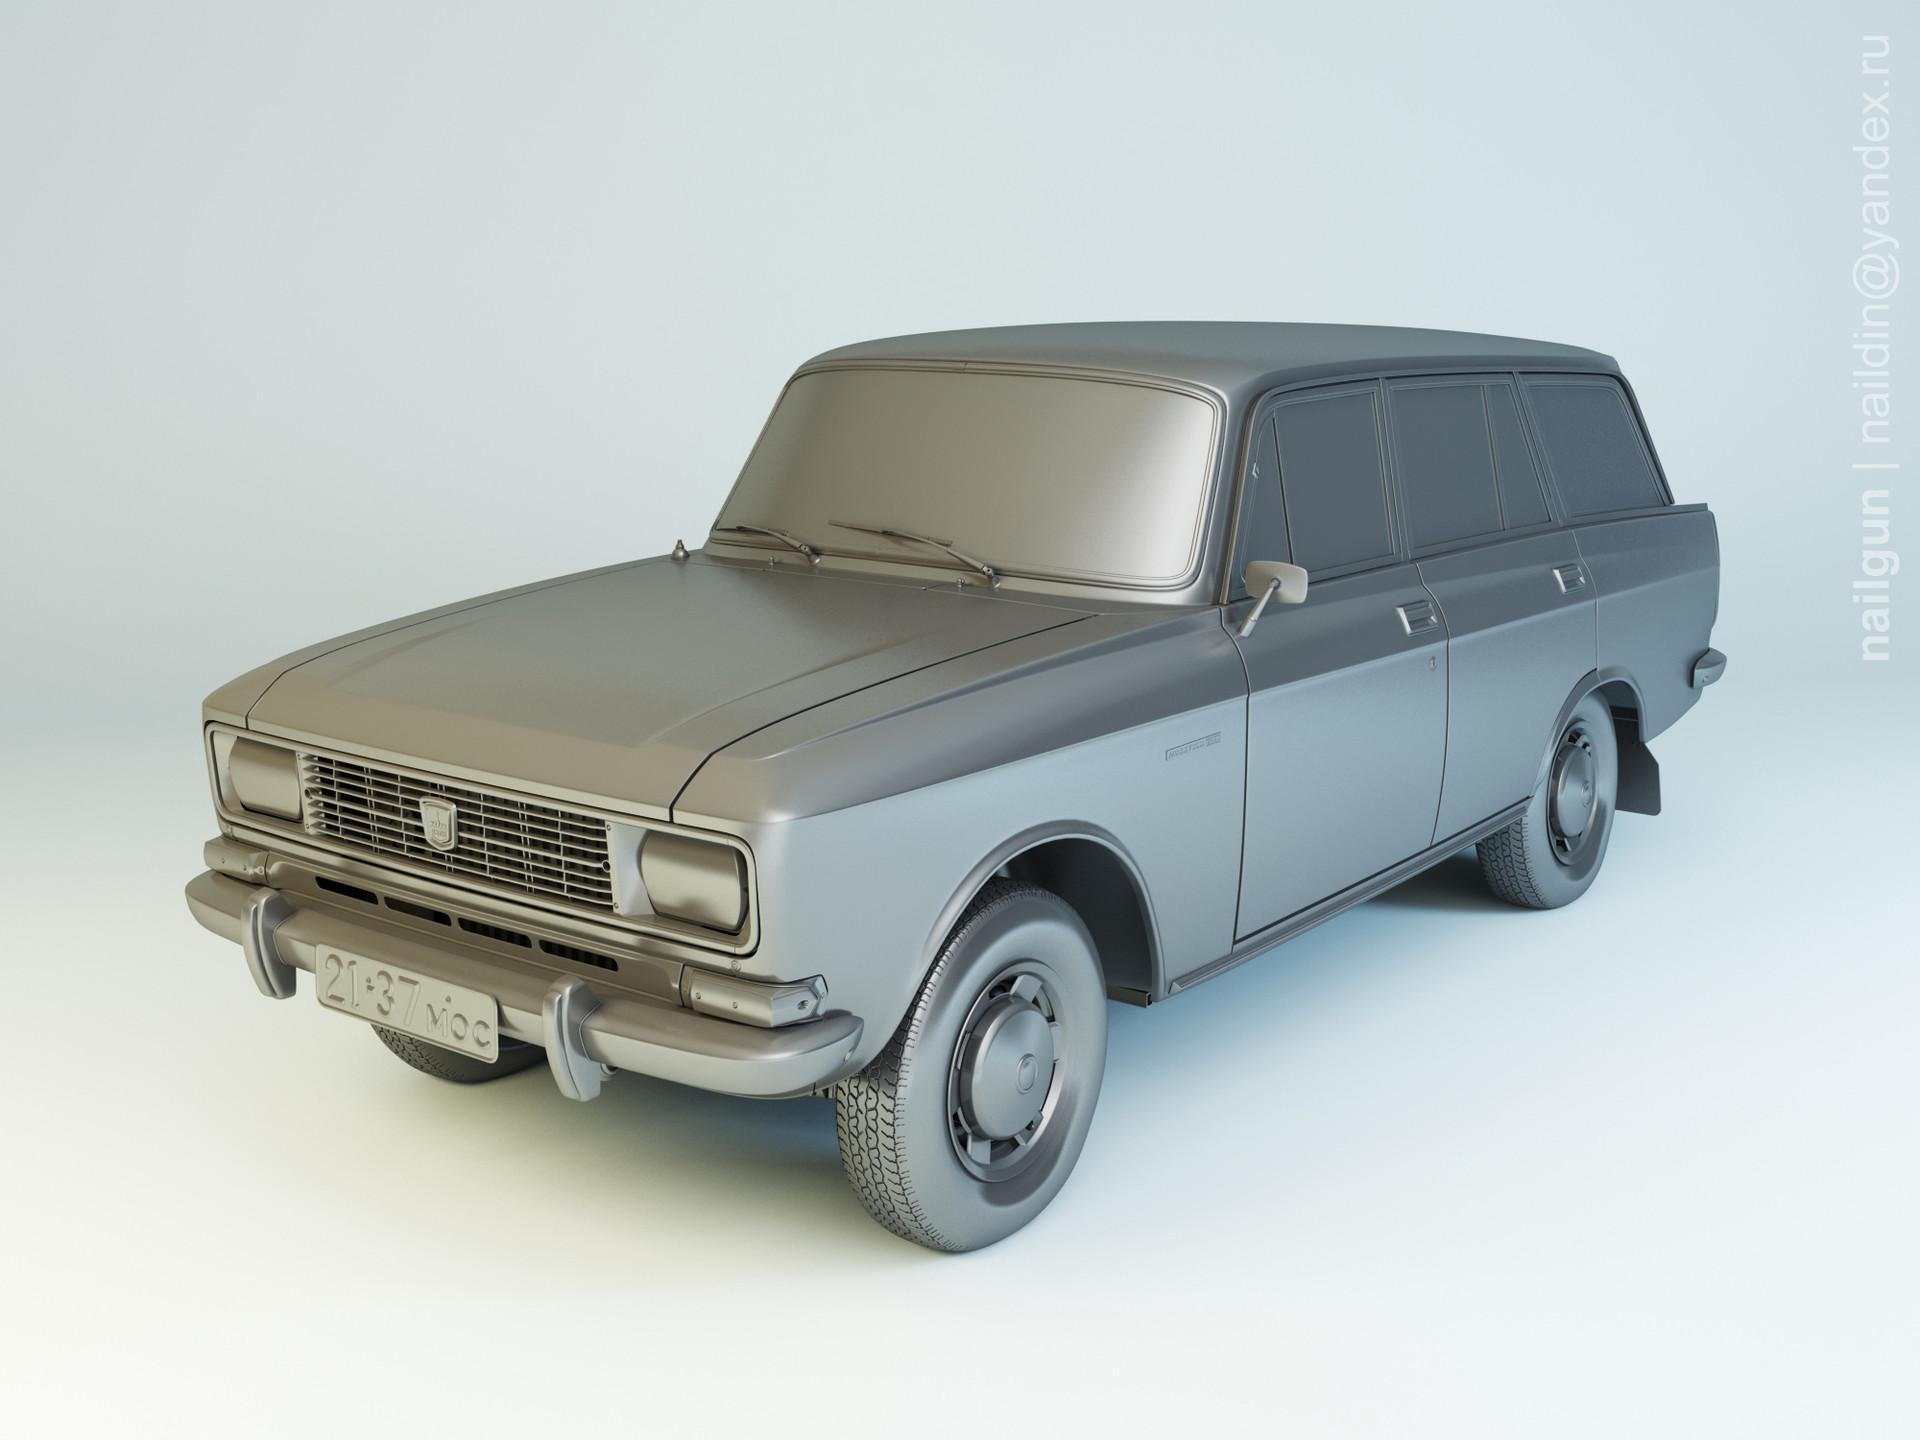 Nail khusnutdinov al 133 005 azlk 2137 moskvich modelling 0